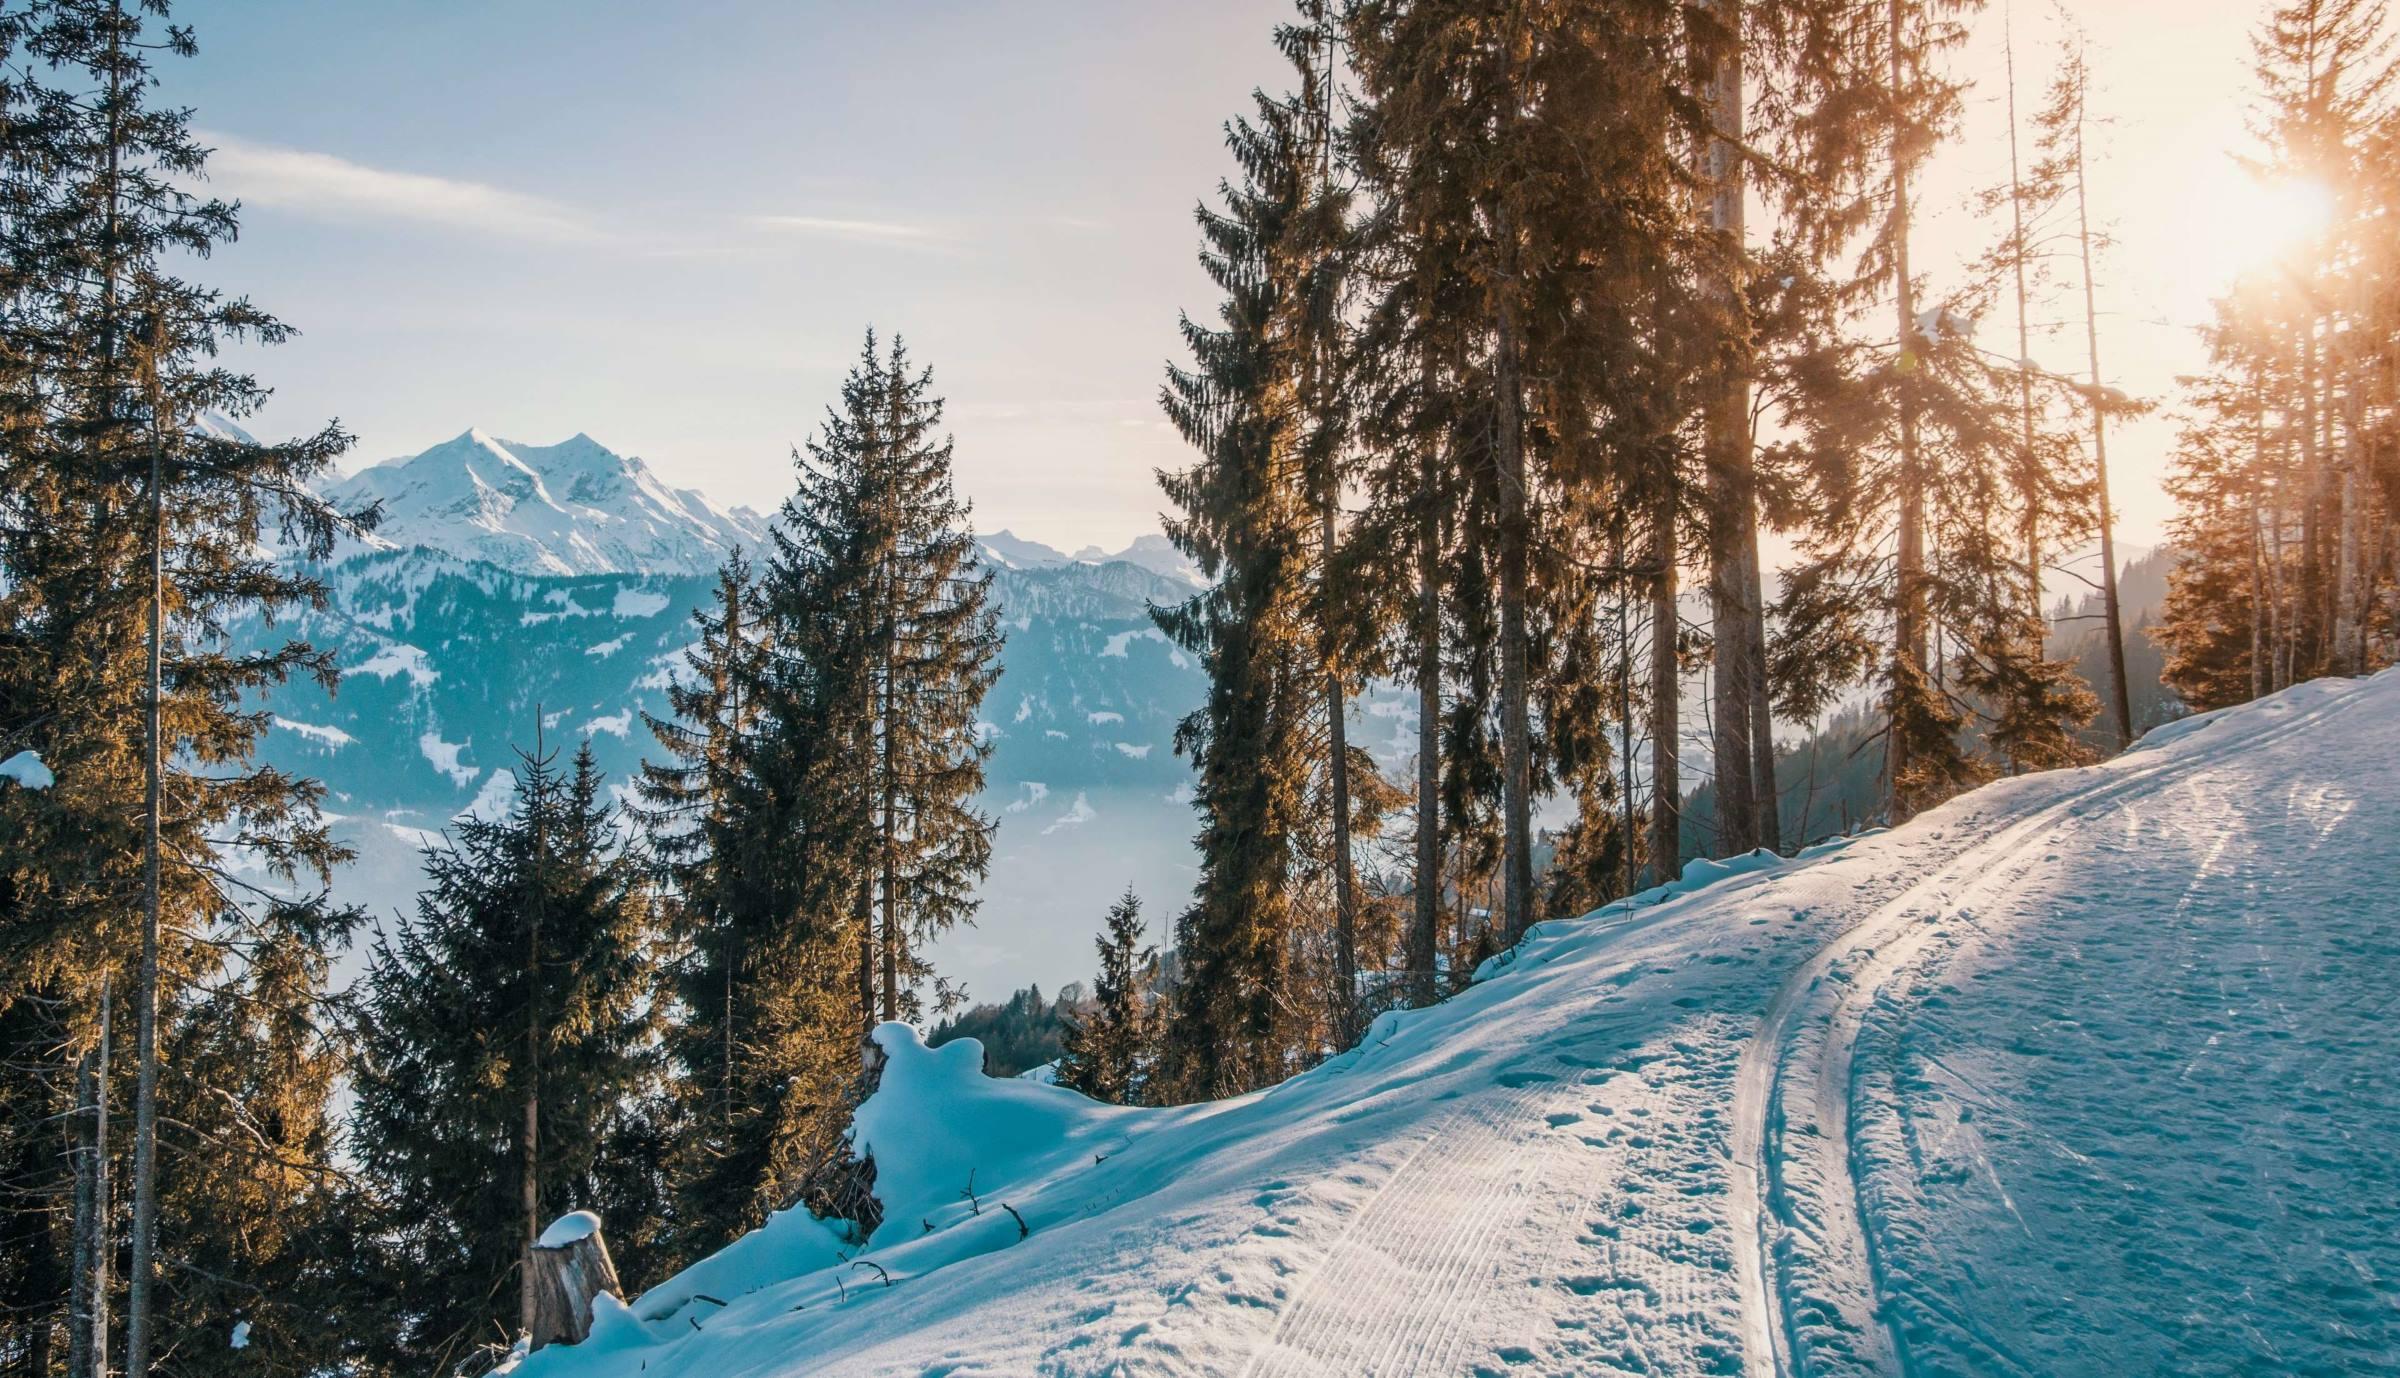 winter landscape pine trees mountains snow